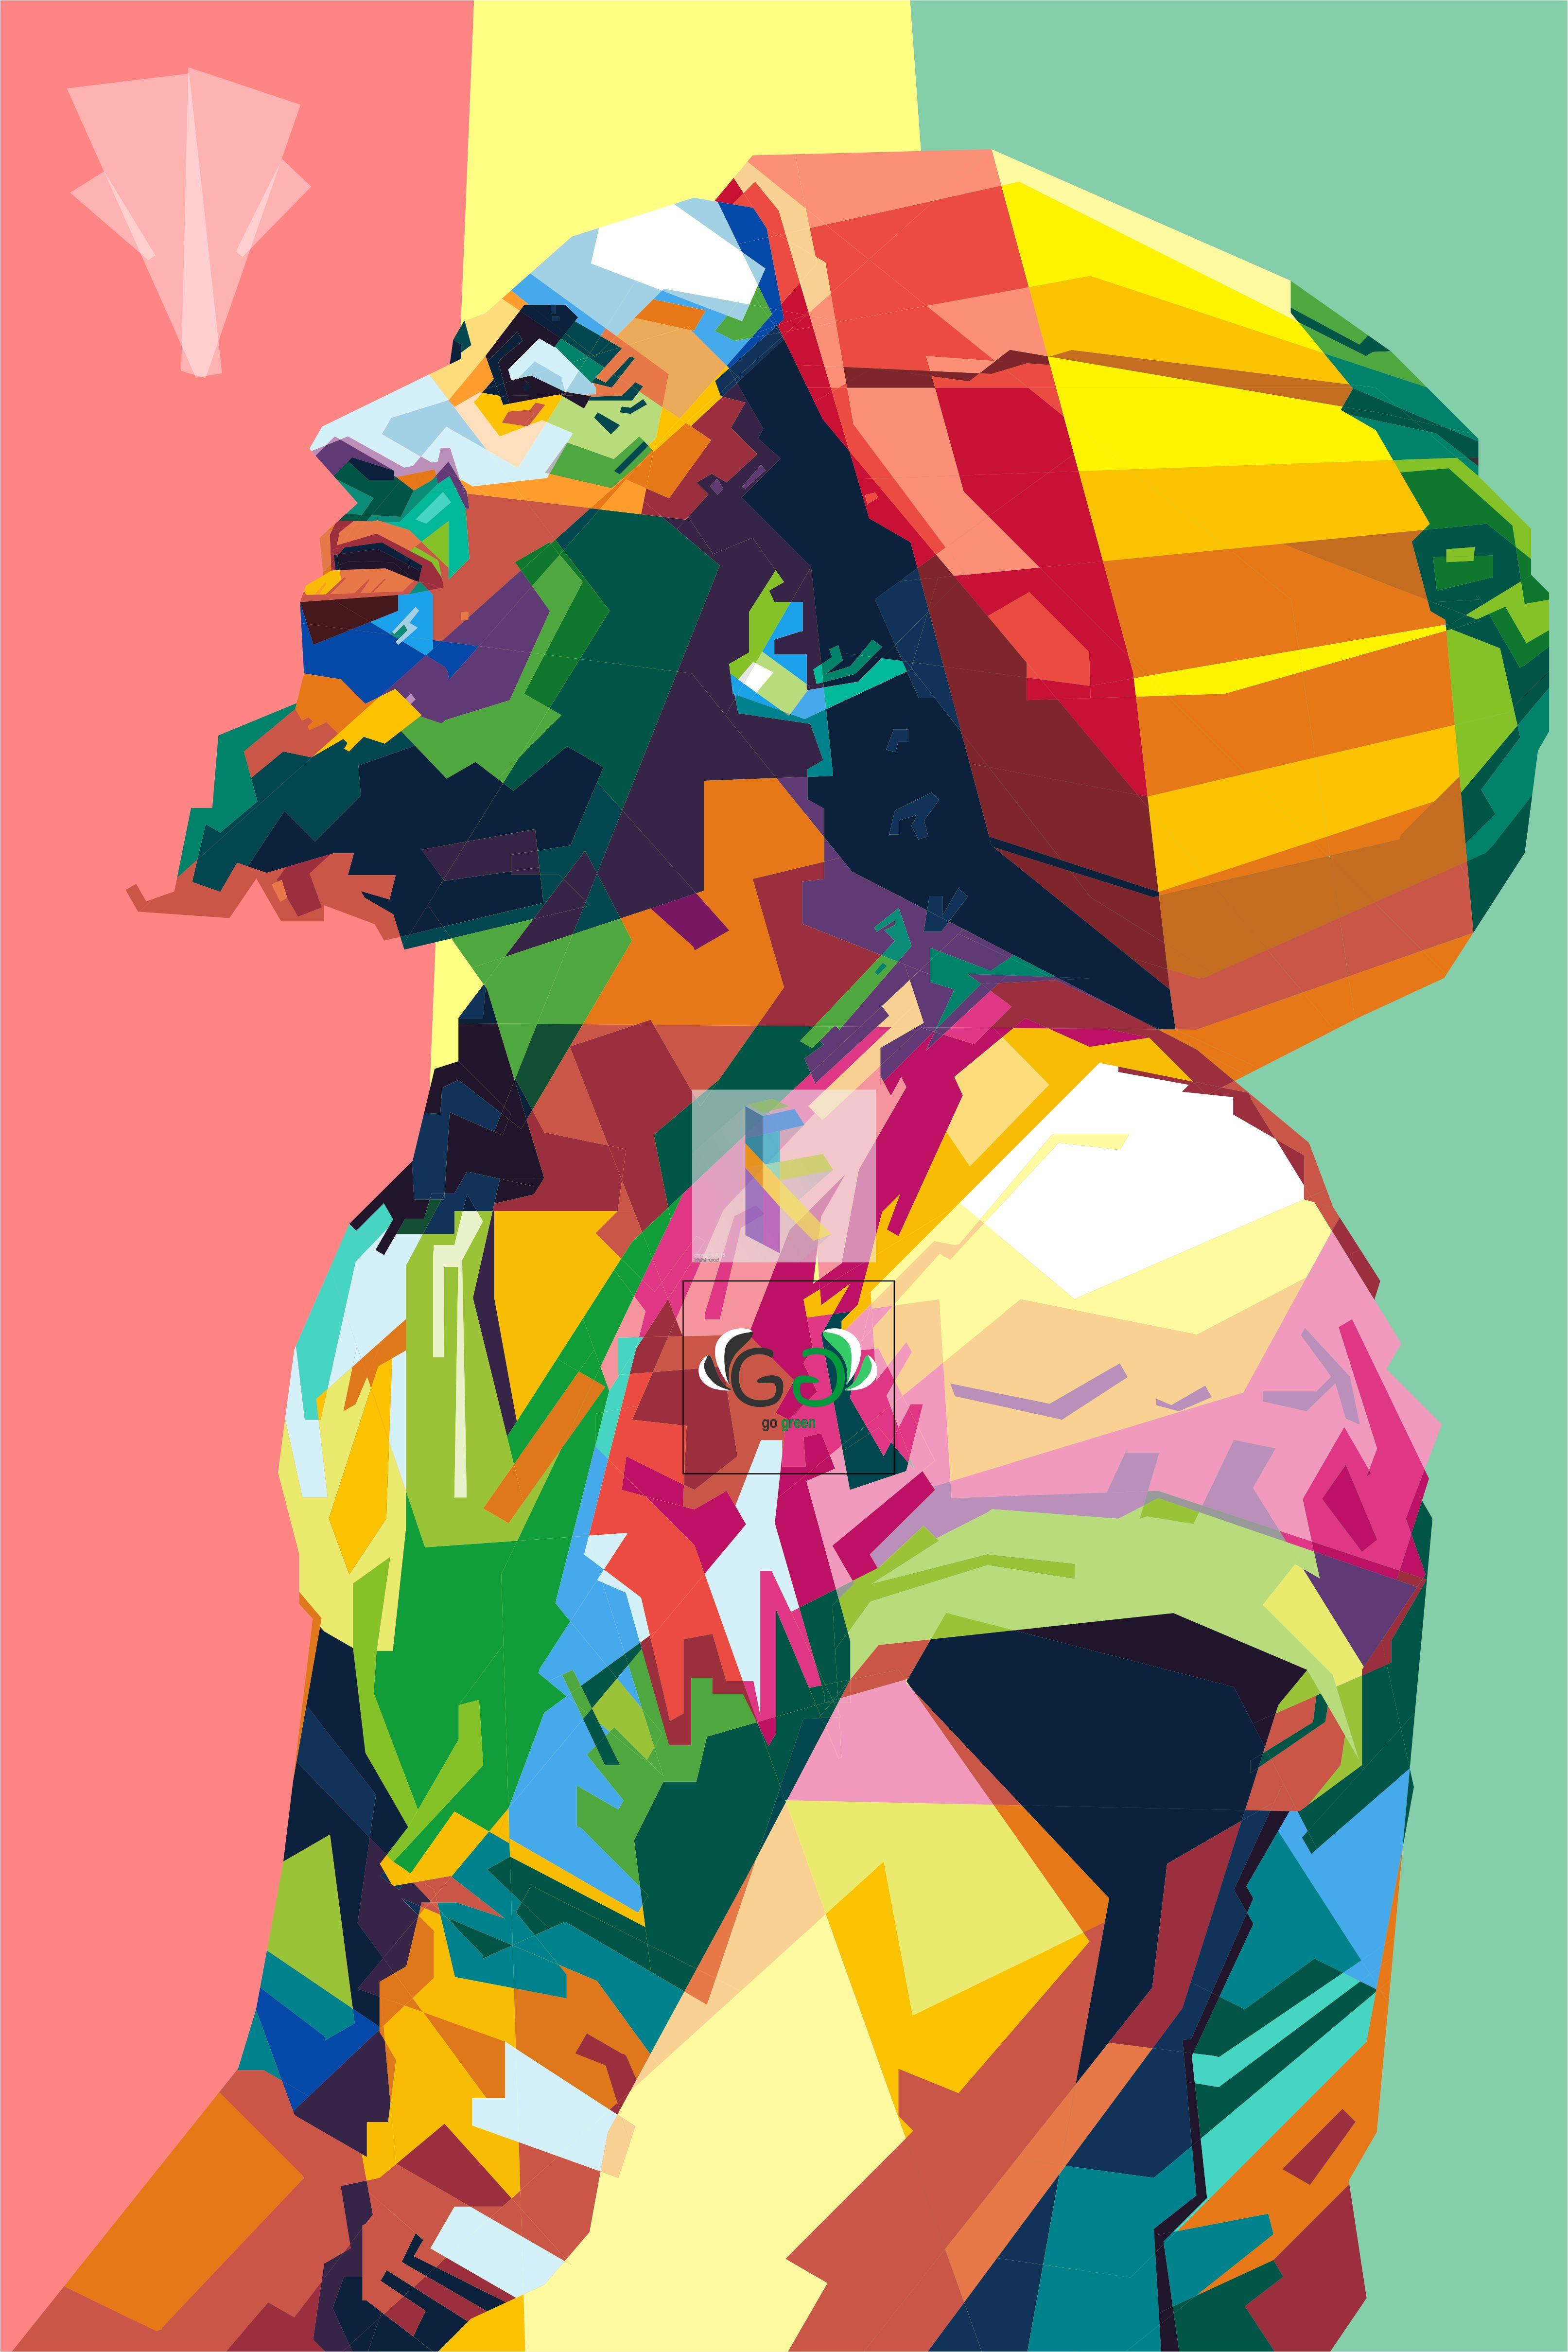 Bob Marley In Wpap Arte Pop Desenho Da Figura Humana Papeis De